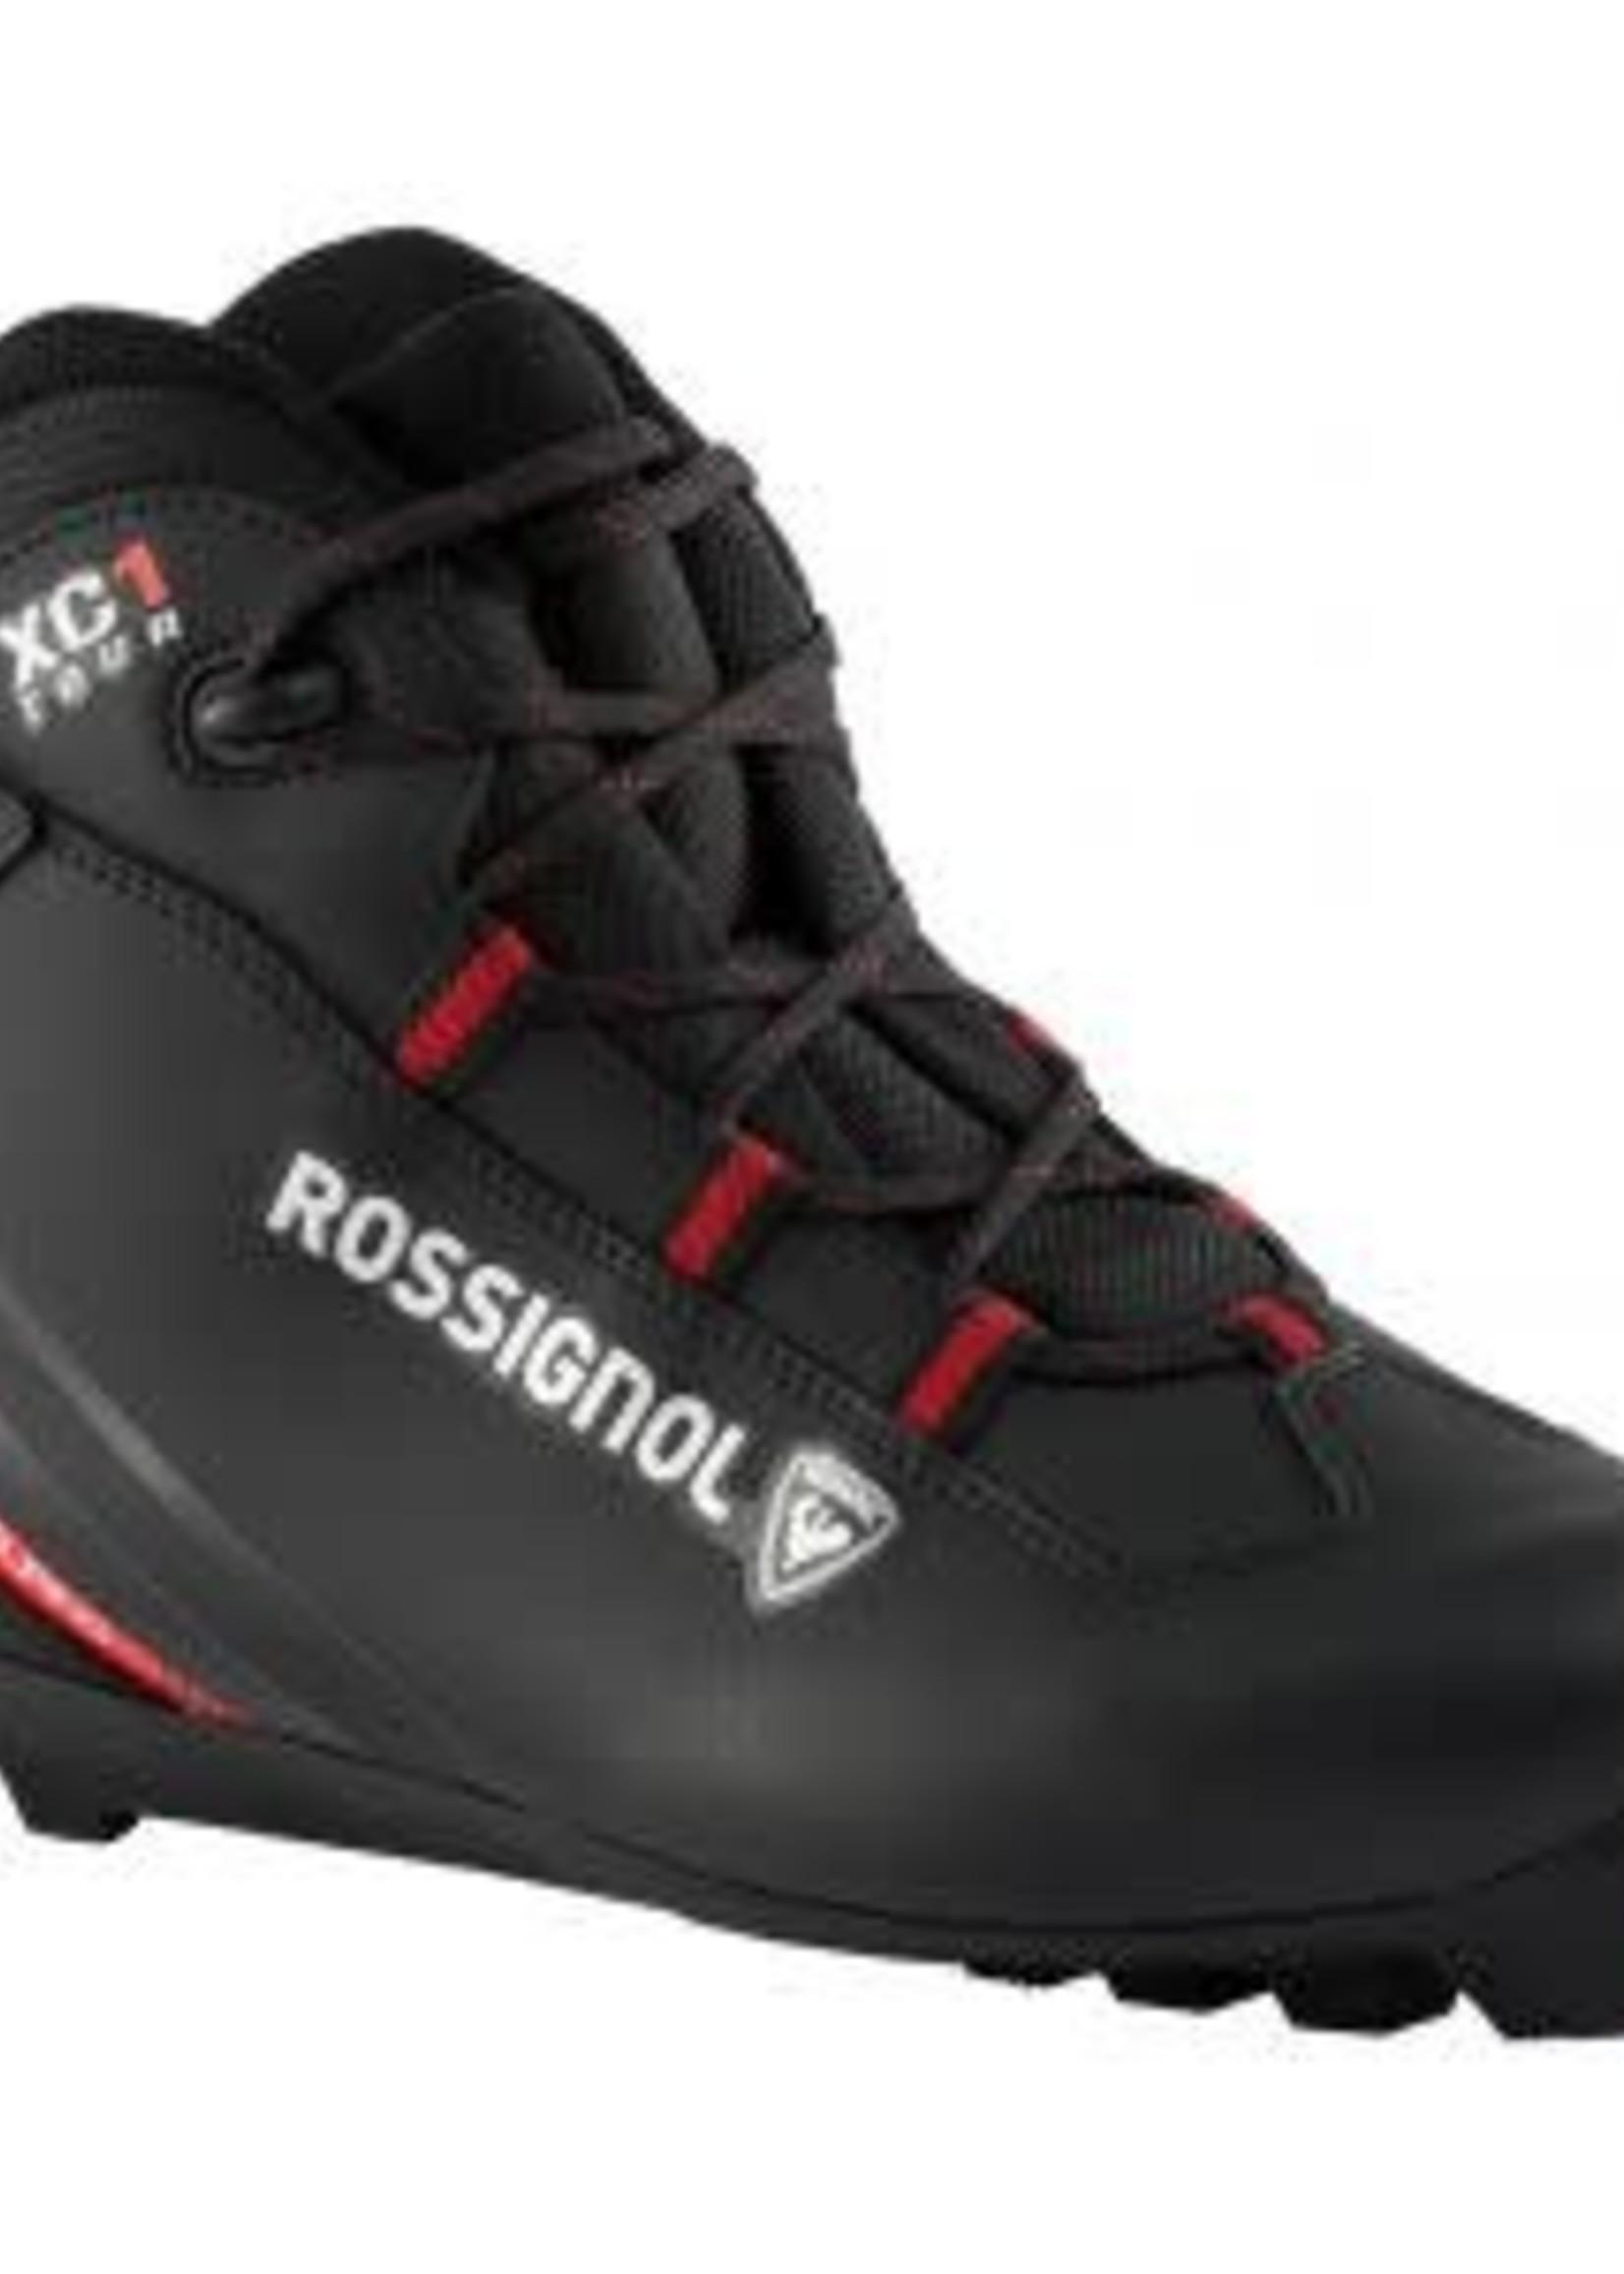 ROSSIGNOL ROSSIGNOL X1 ULTRA FW XC SKI BOOT